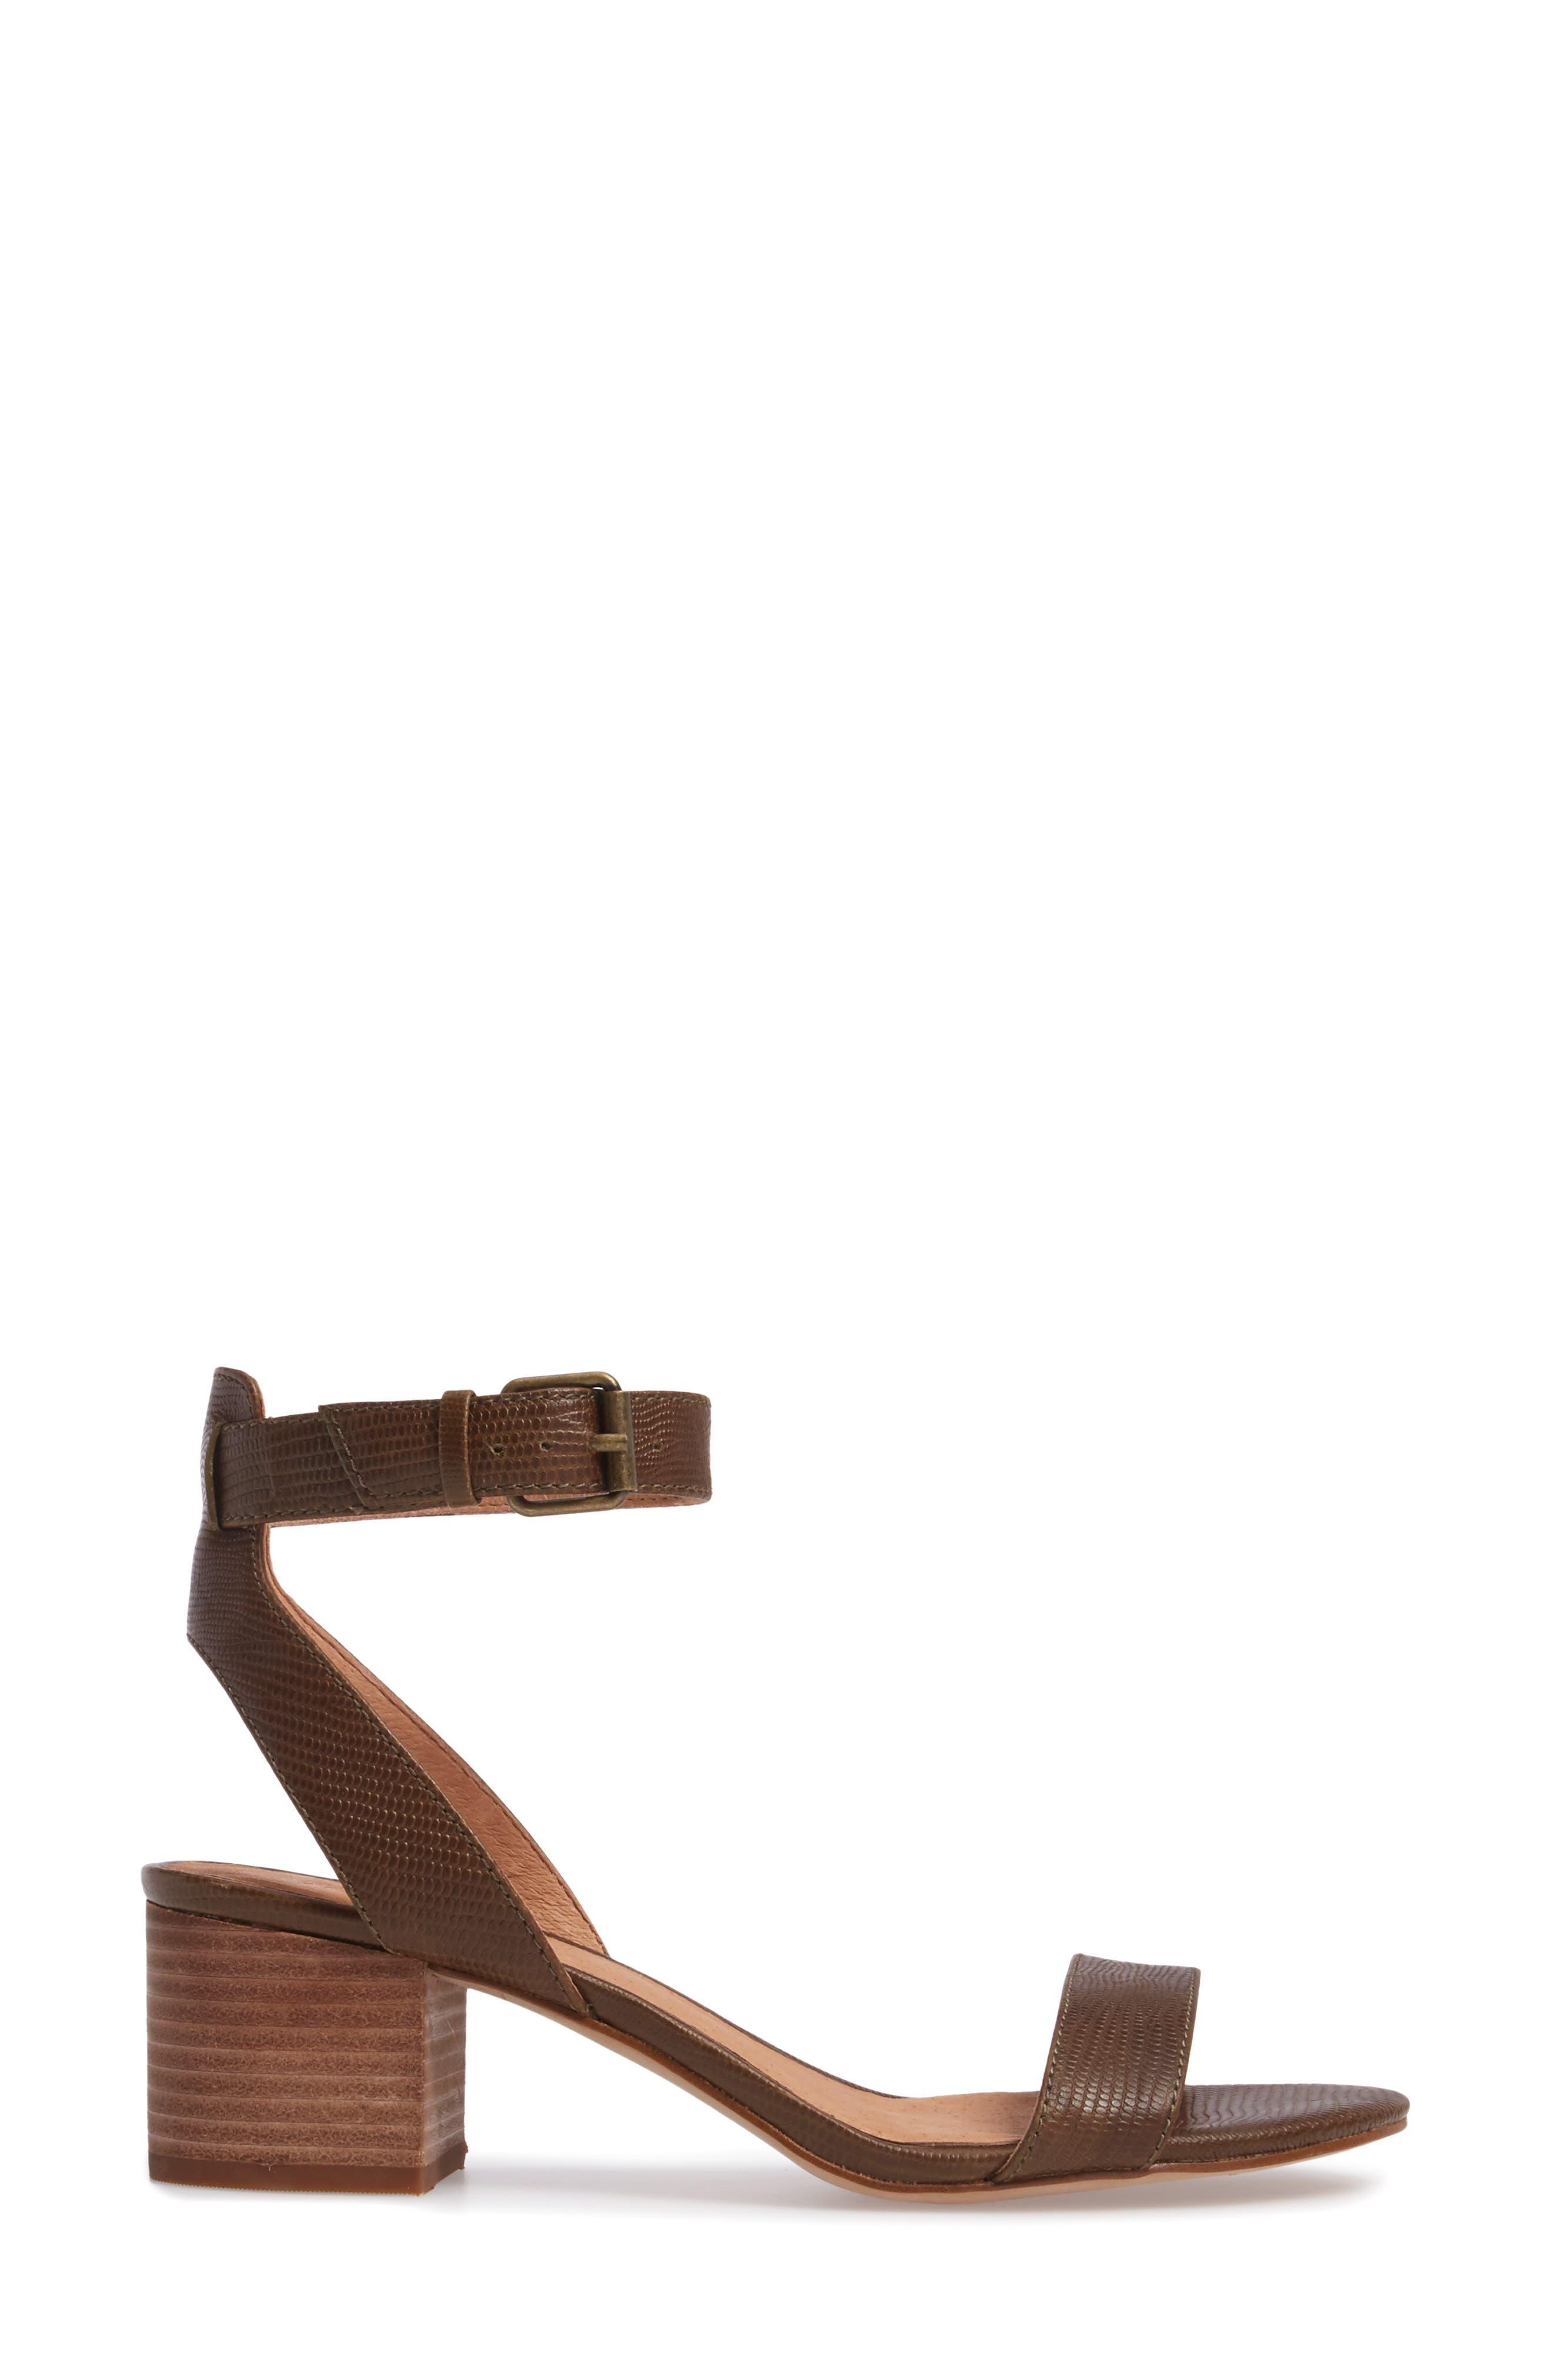 Alternate Image 3  - Madewell Alice Embossed Ankle Wrap Sandal (Women)